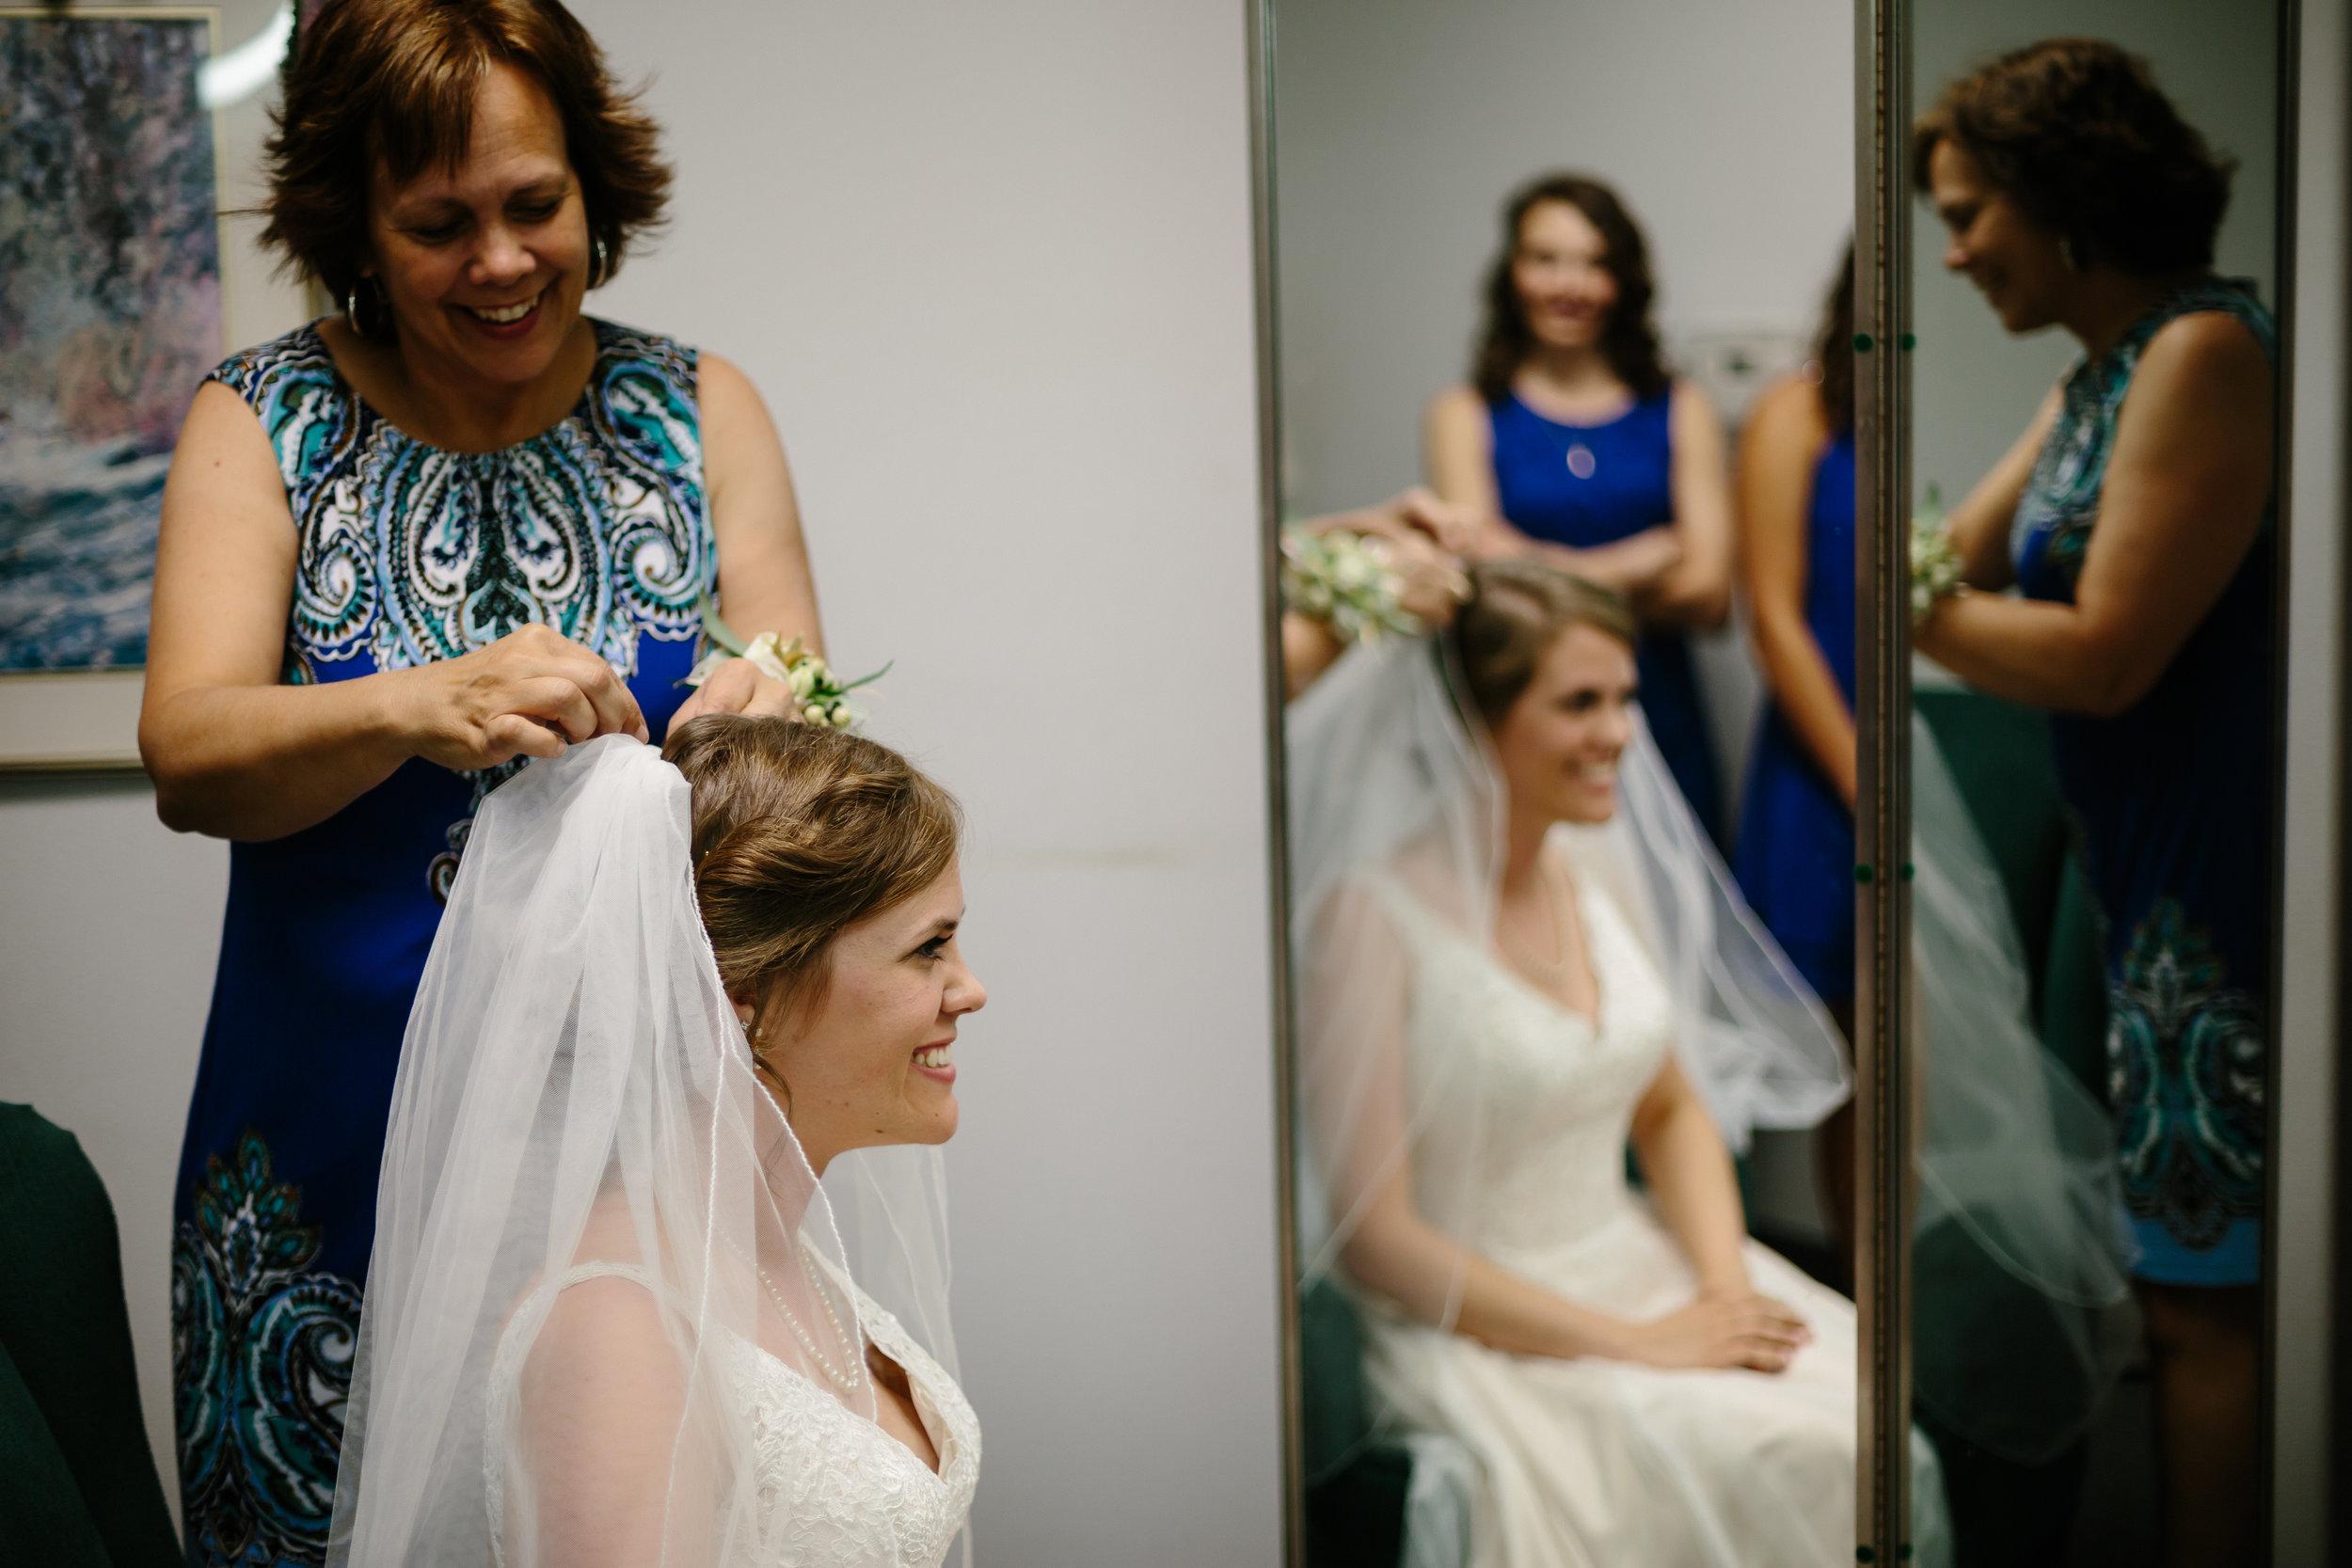 Jordan & Shantel Married - Idaho - Corrie Mick Photography-51.jpg